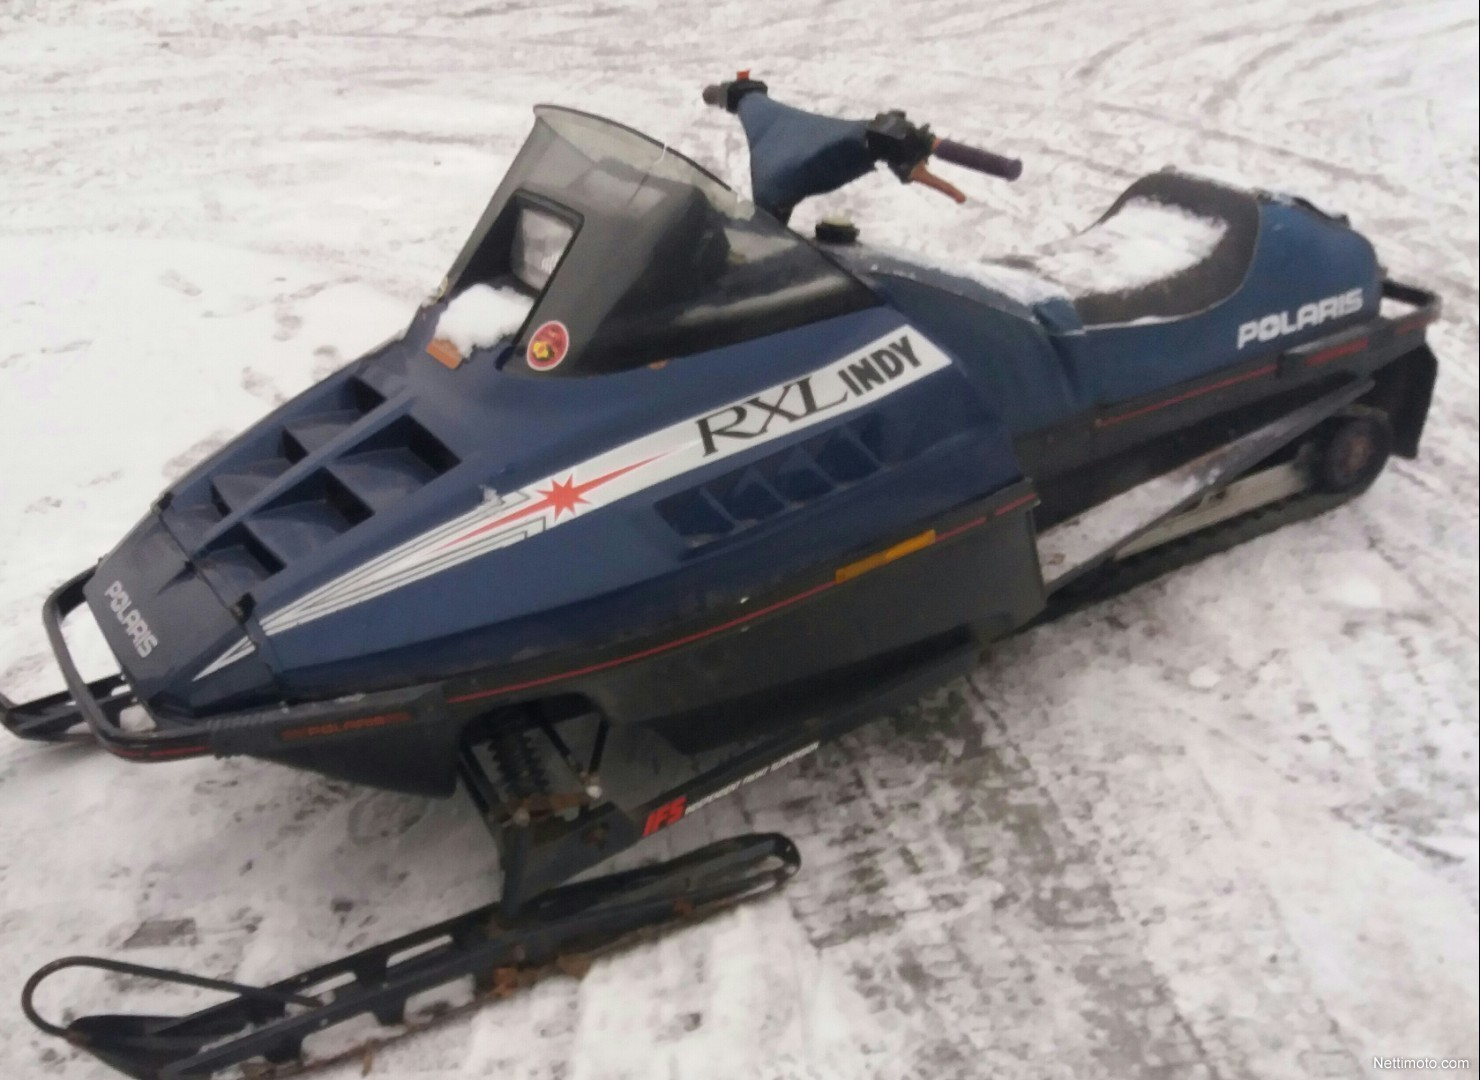 Polaris Indy Rxl 650 Efi Sks 650 Cm U00b3 1991 - Hankasalmi - Moottorikelkka